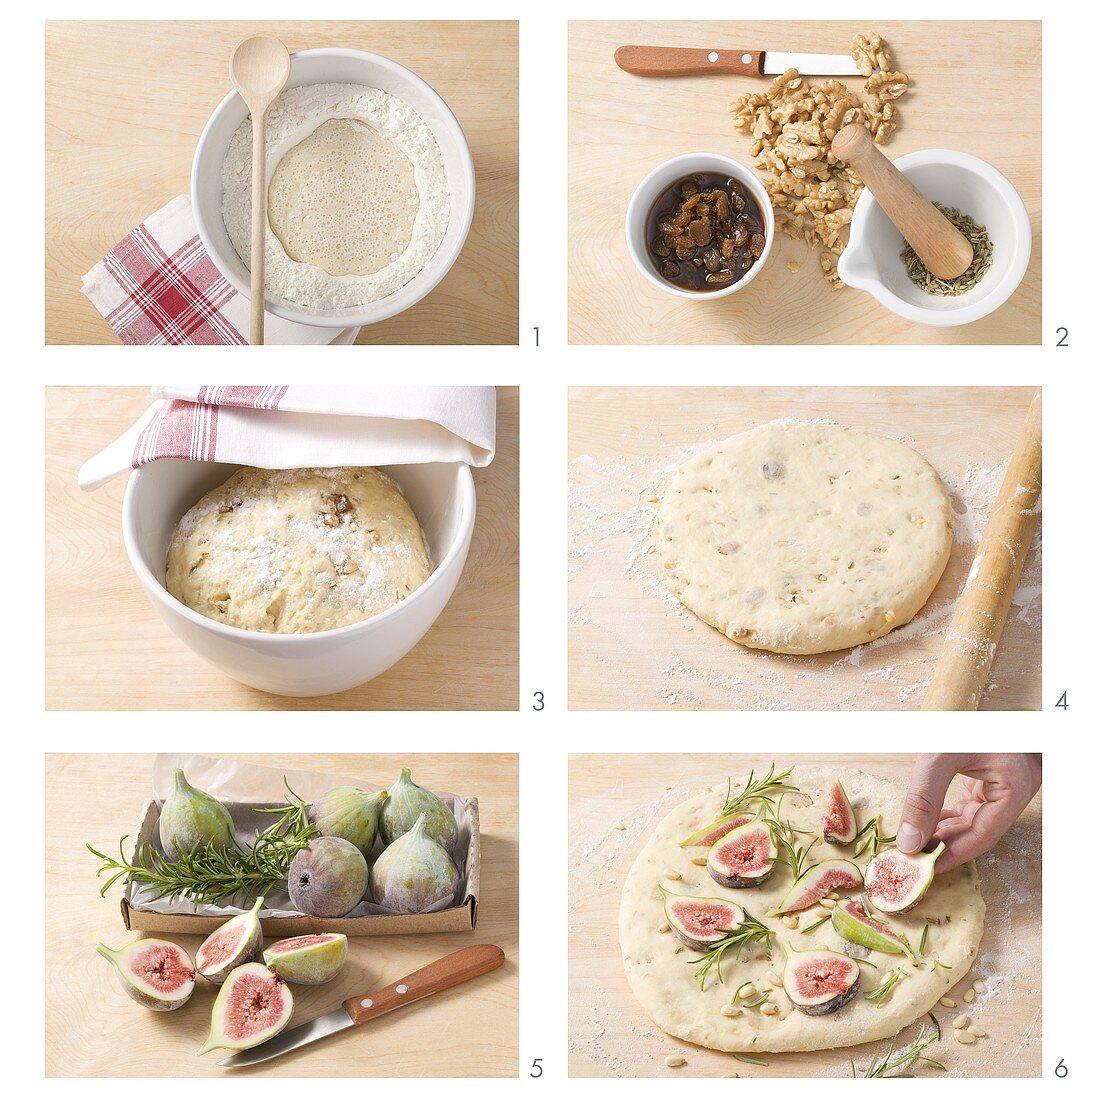 Making schiacciata ai fichi (flatbread with figs)